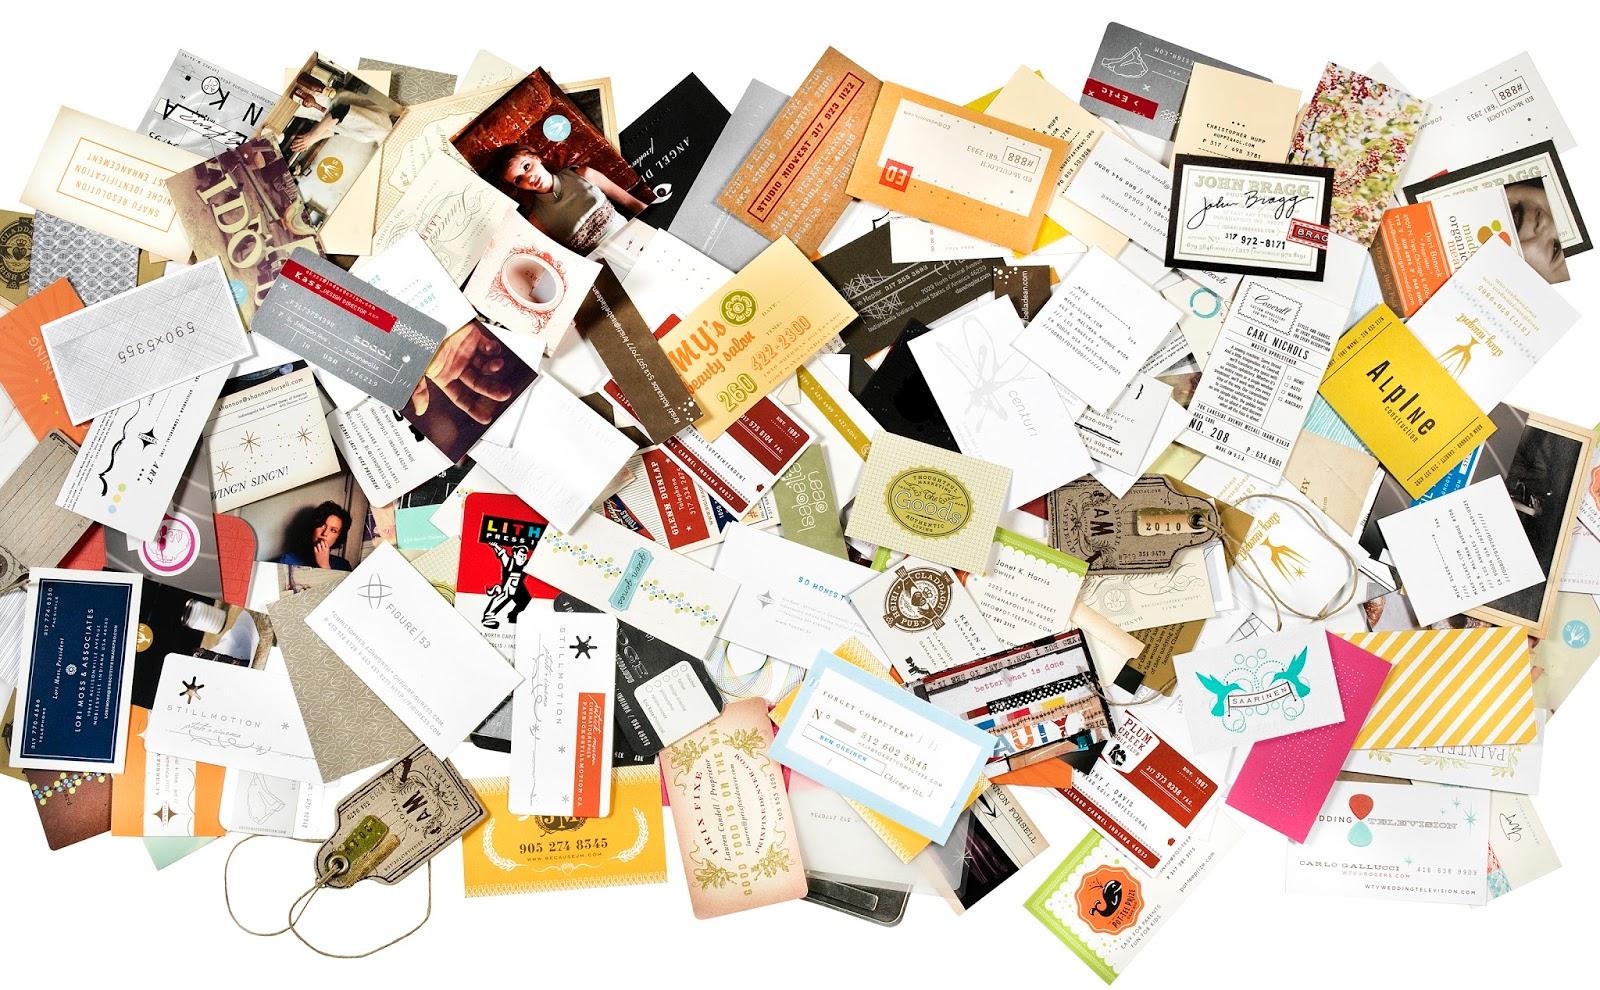 Funnel : Eric Kass - Communique: * Design : Big Pile of Business ...